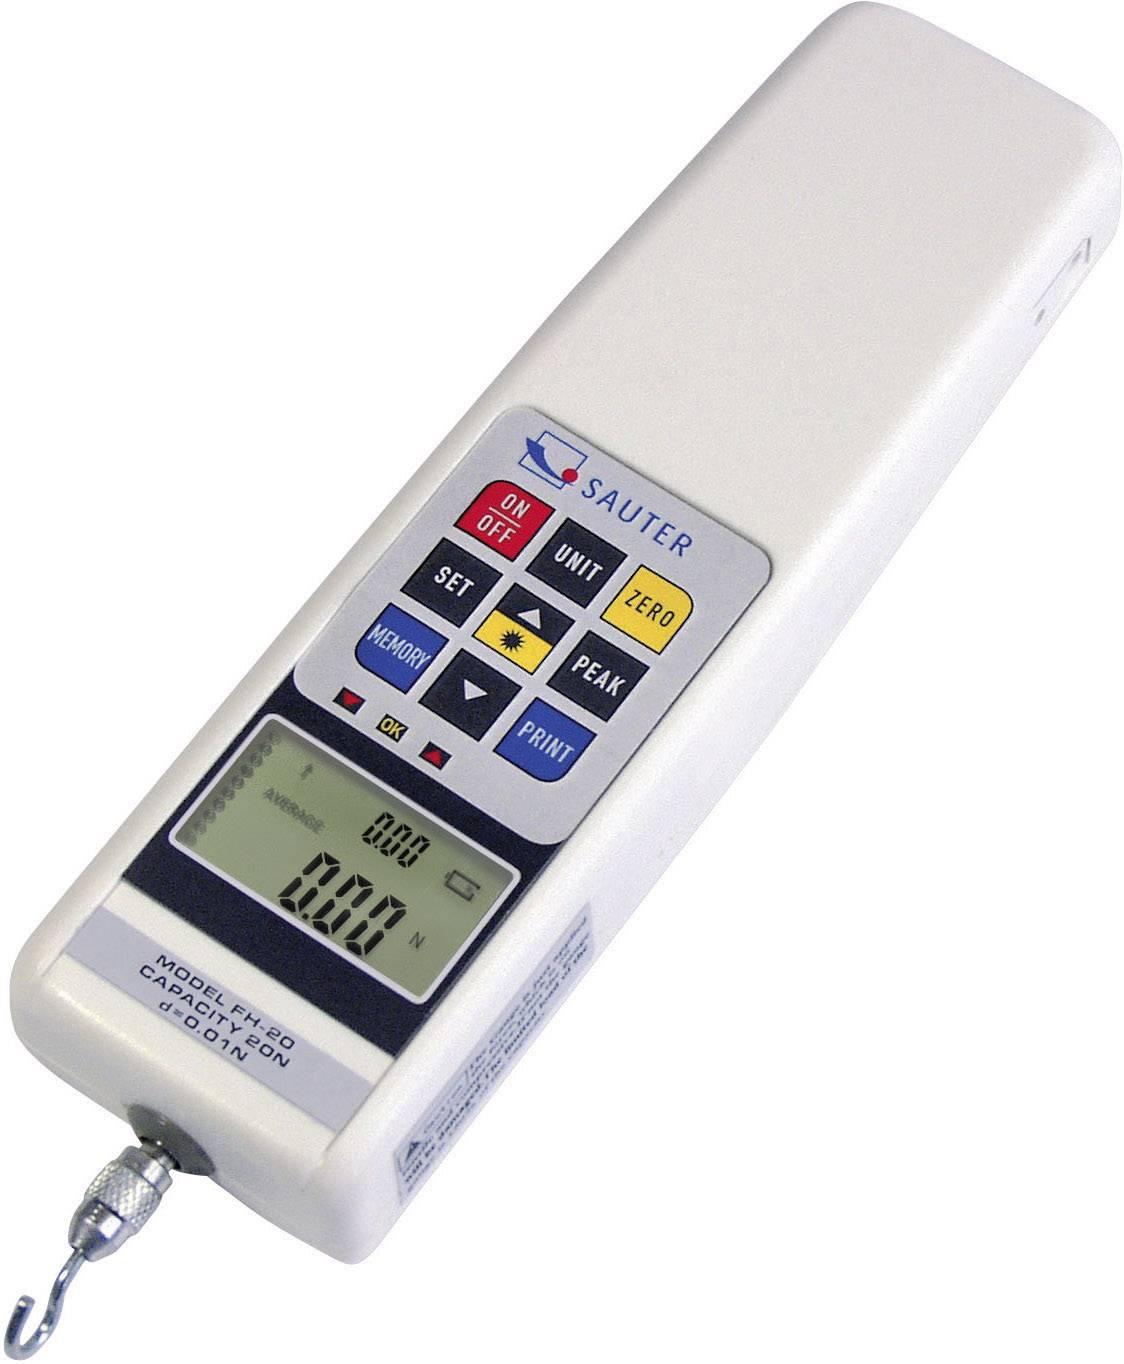 Sauter FH 500. Kraftmessgerät, Newton-Meter Kalibrováno dle ISO